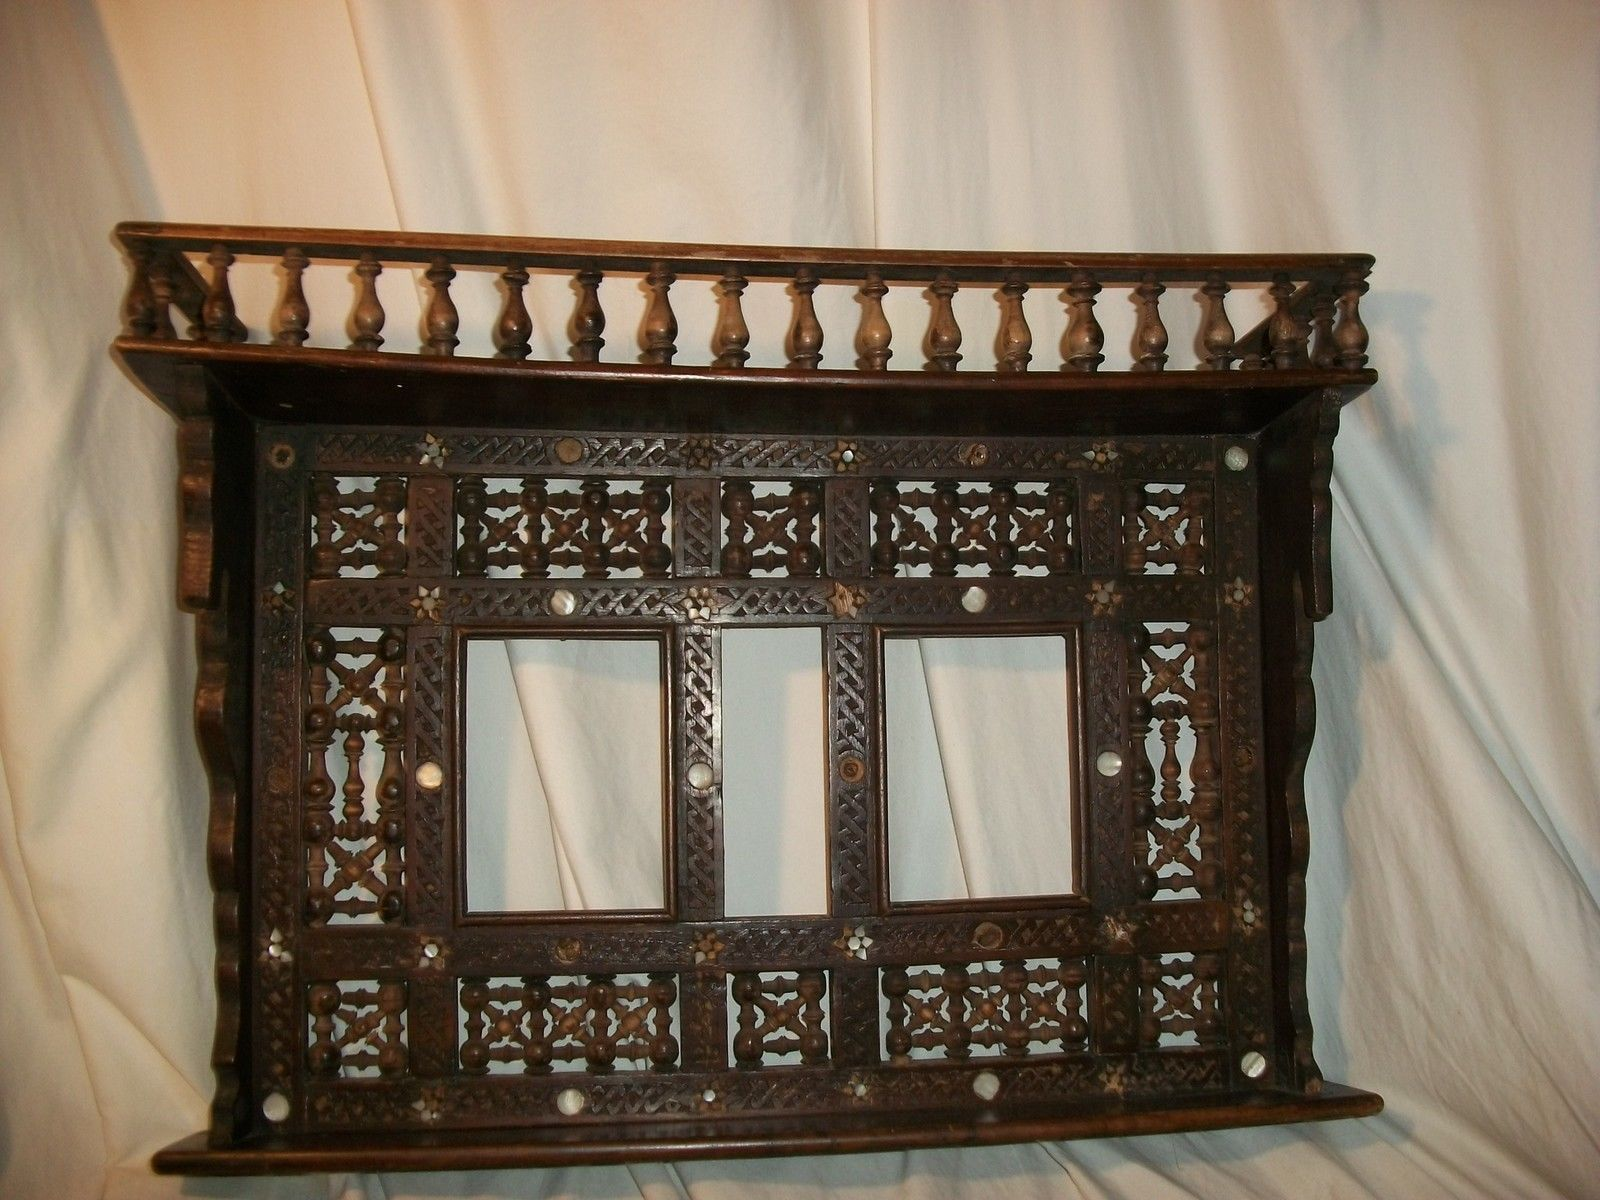 Authentic egyptian furniture - Vintage Handcrafted Egyptian Middle Eastern Islamic Mashrabiya Wood Wall Shelf